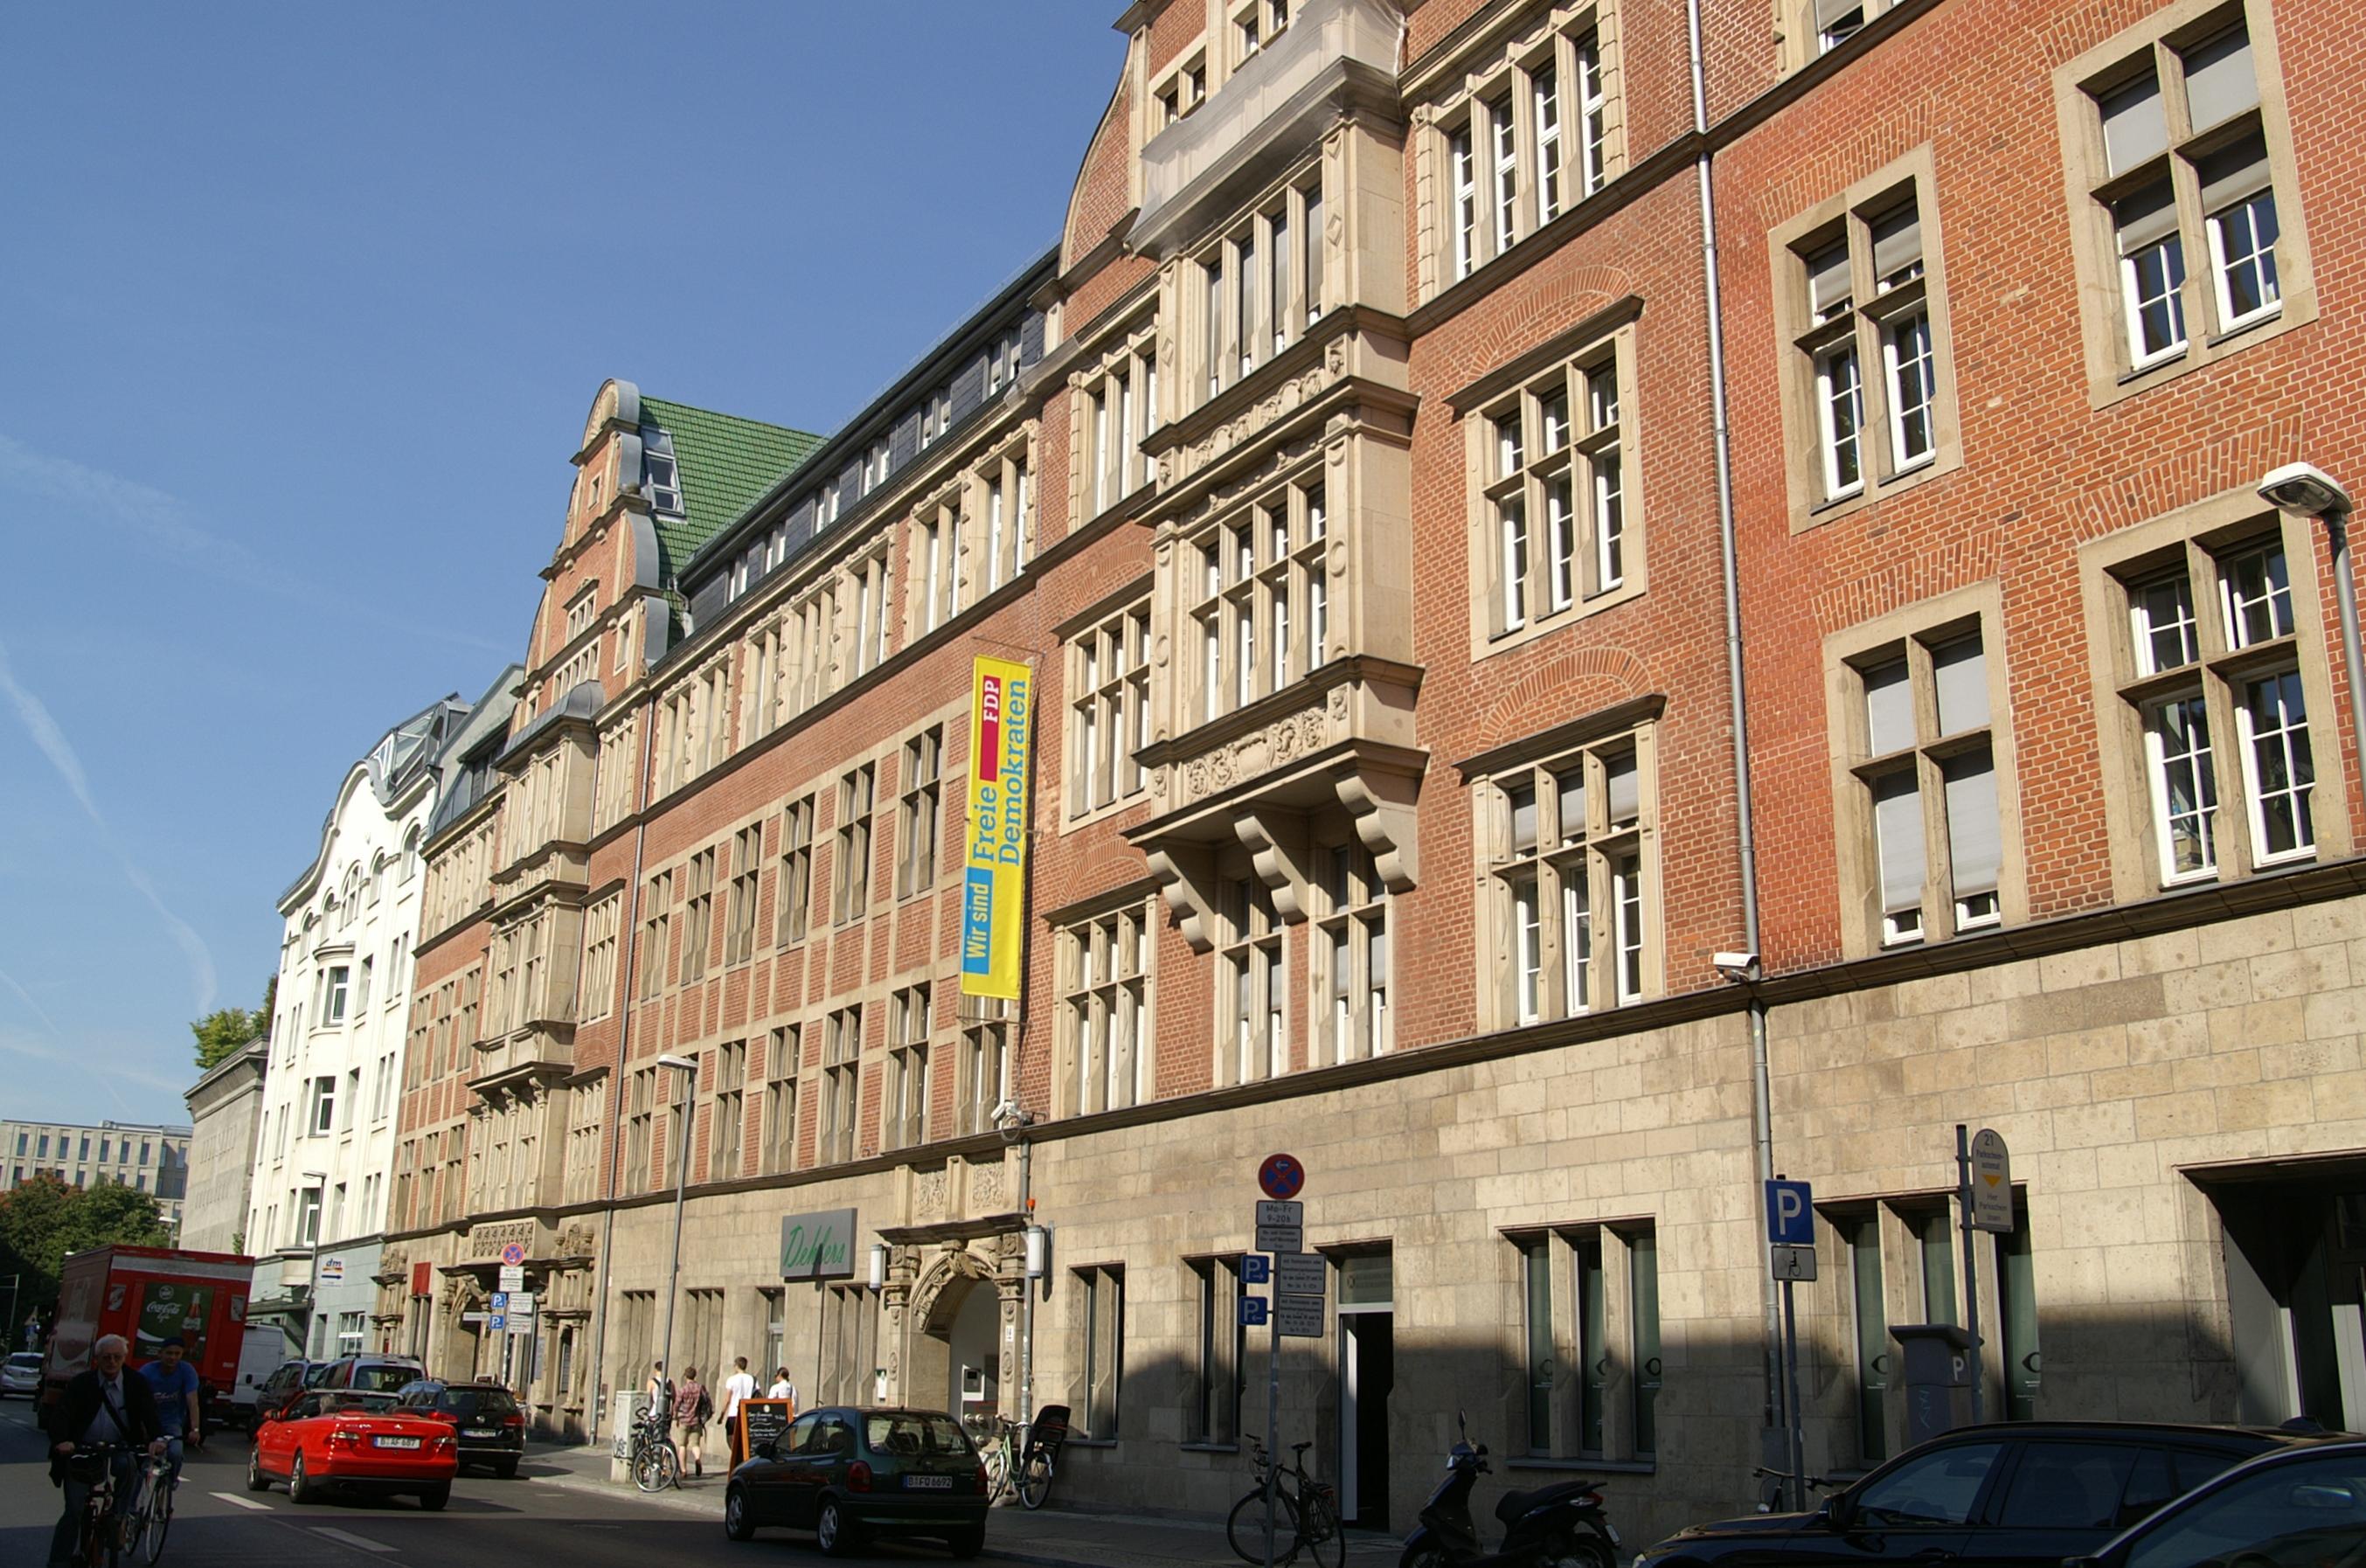 Hans-Dietrich-Genscher-Haus, Berlin